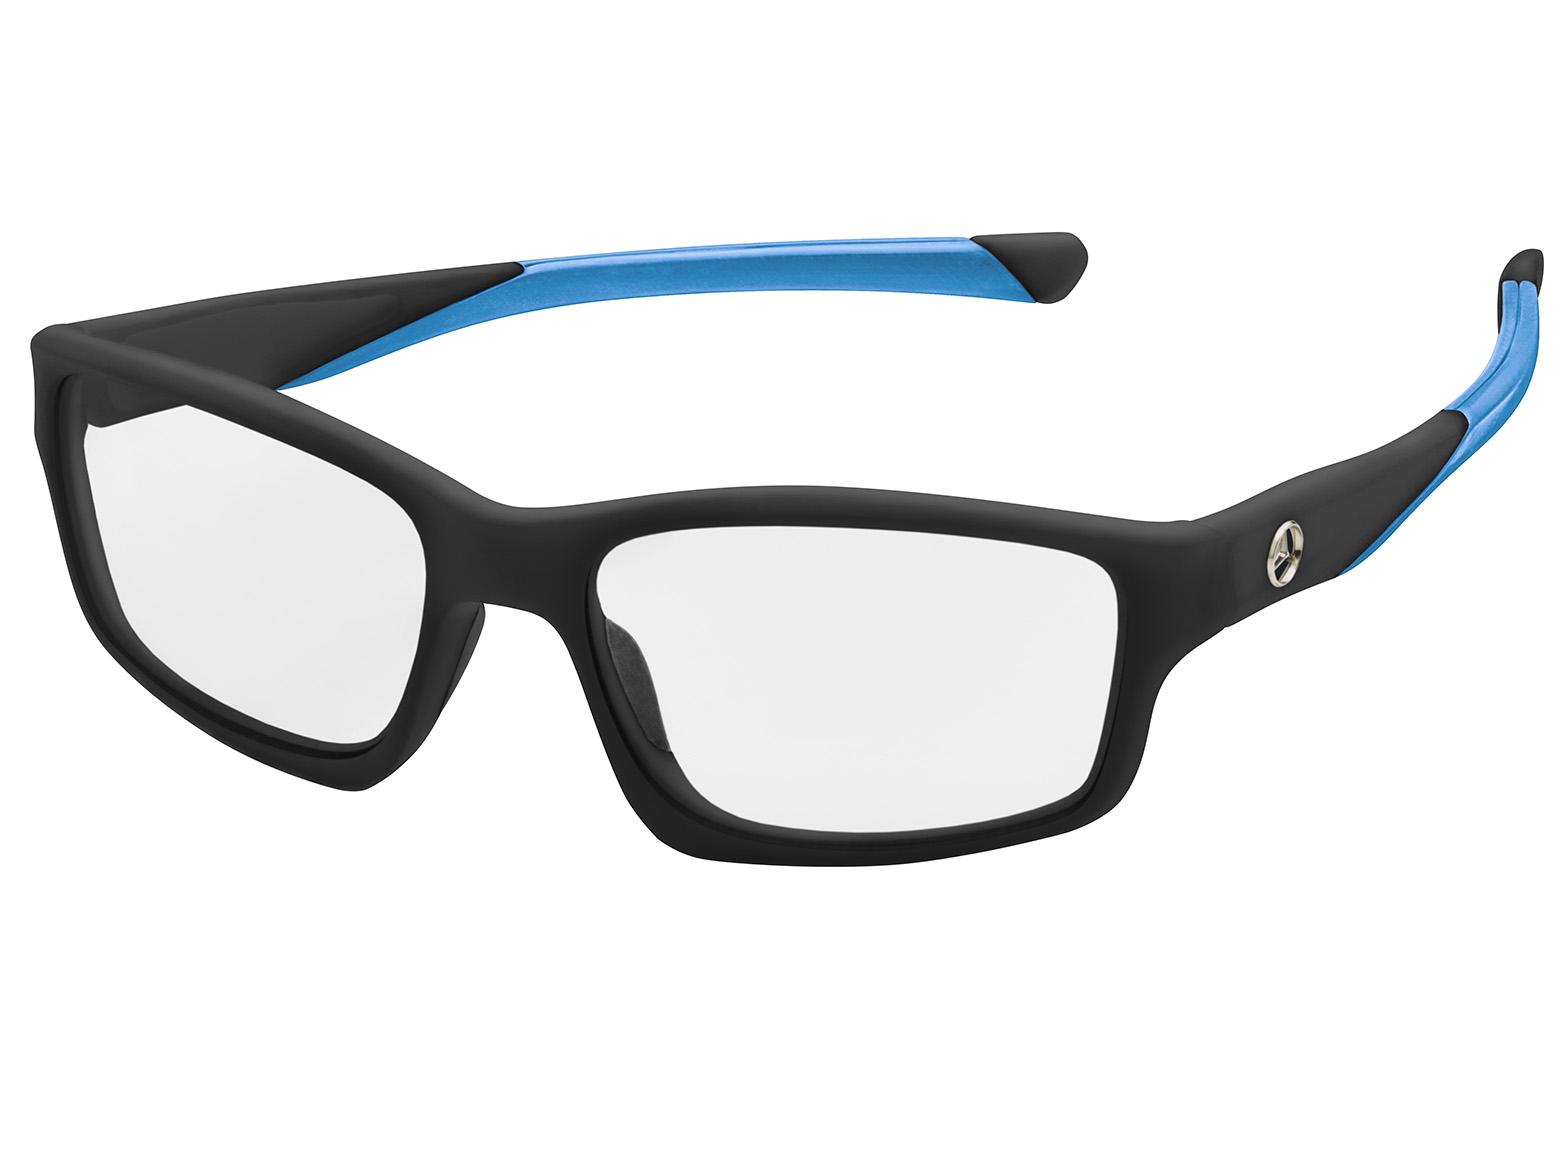 Солнцезащитные очки Mercedes Sunglasses, Sport, Black / Blue